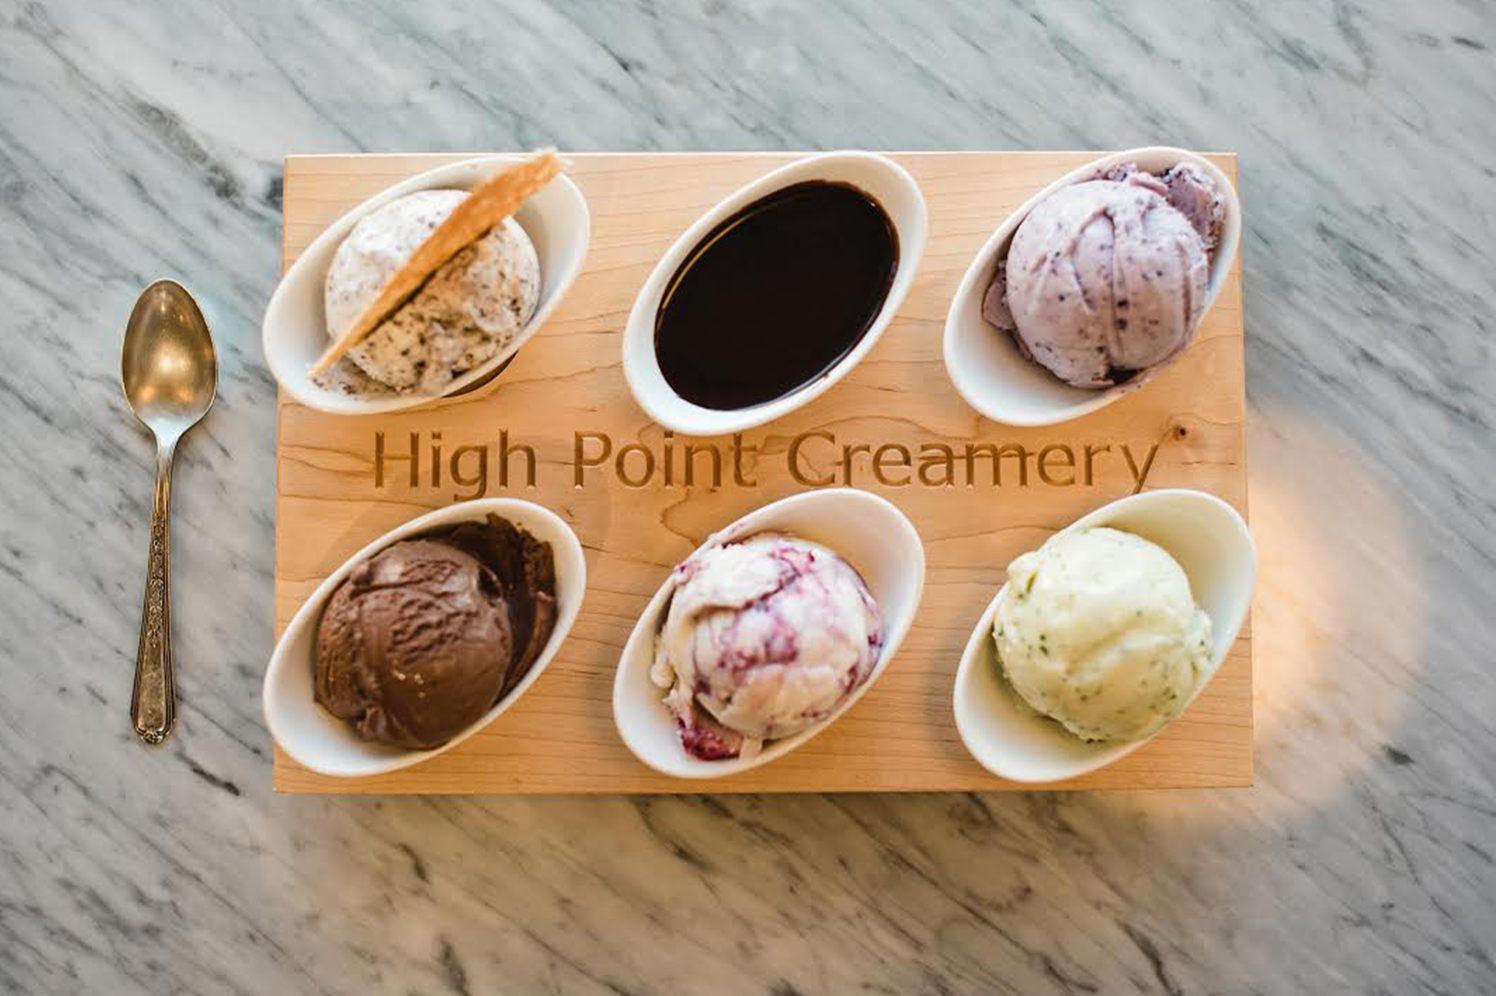 High point creamery